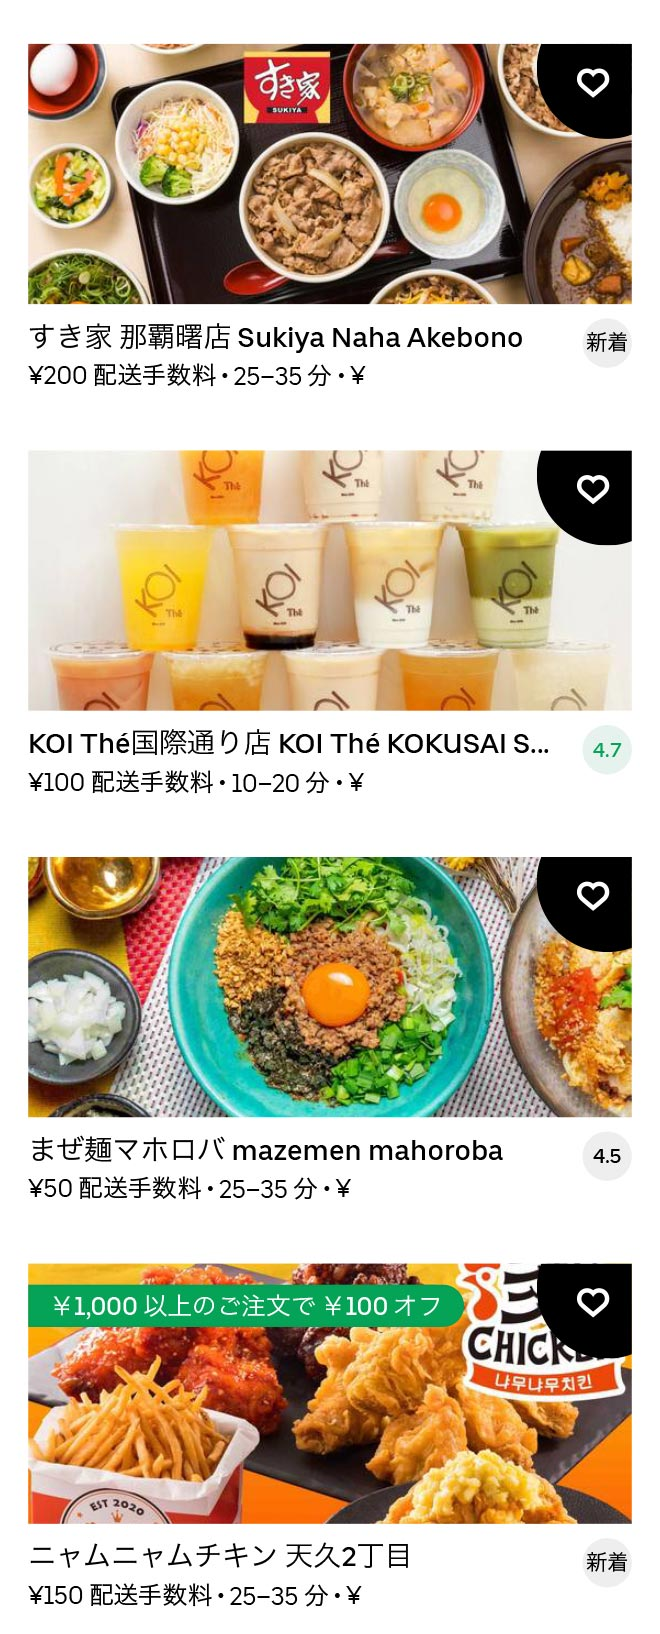 O kenchomae menu 2011 04